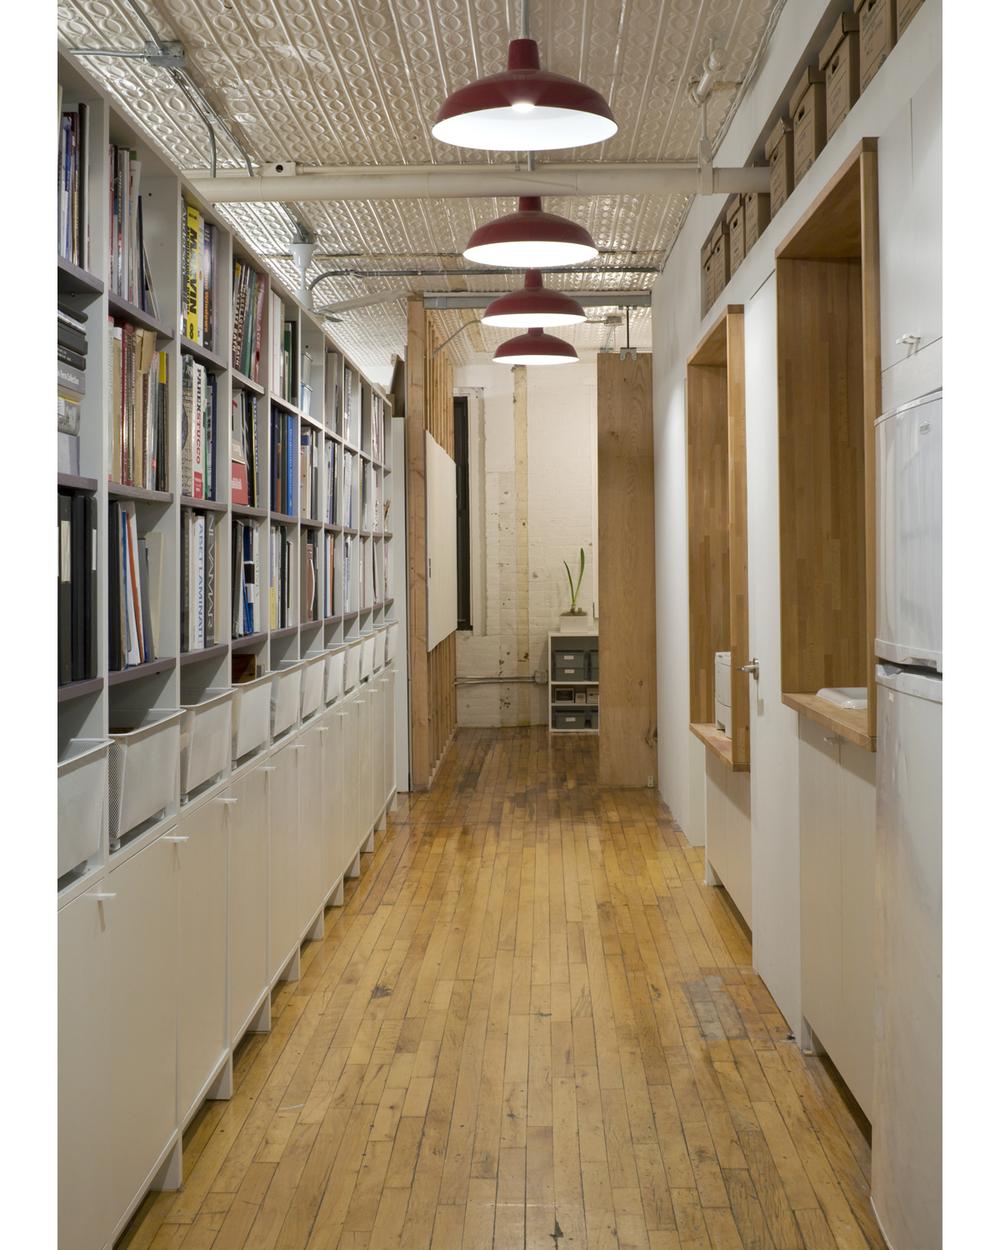 07b_fso_hallway.jpg